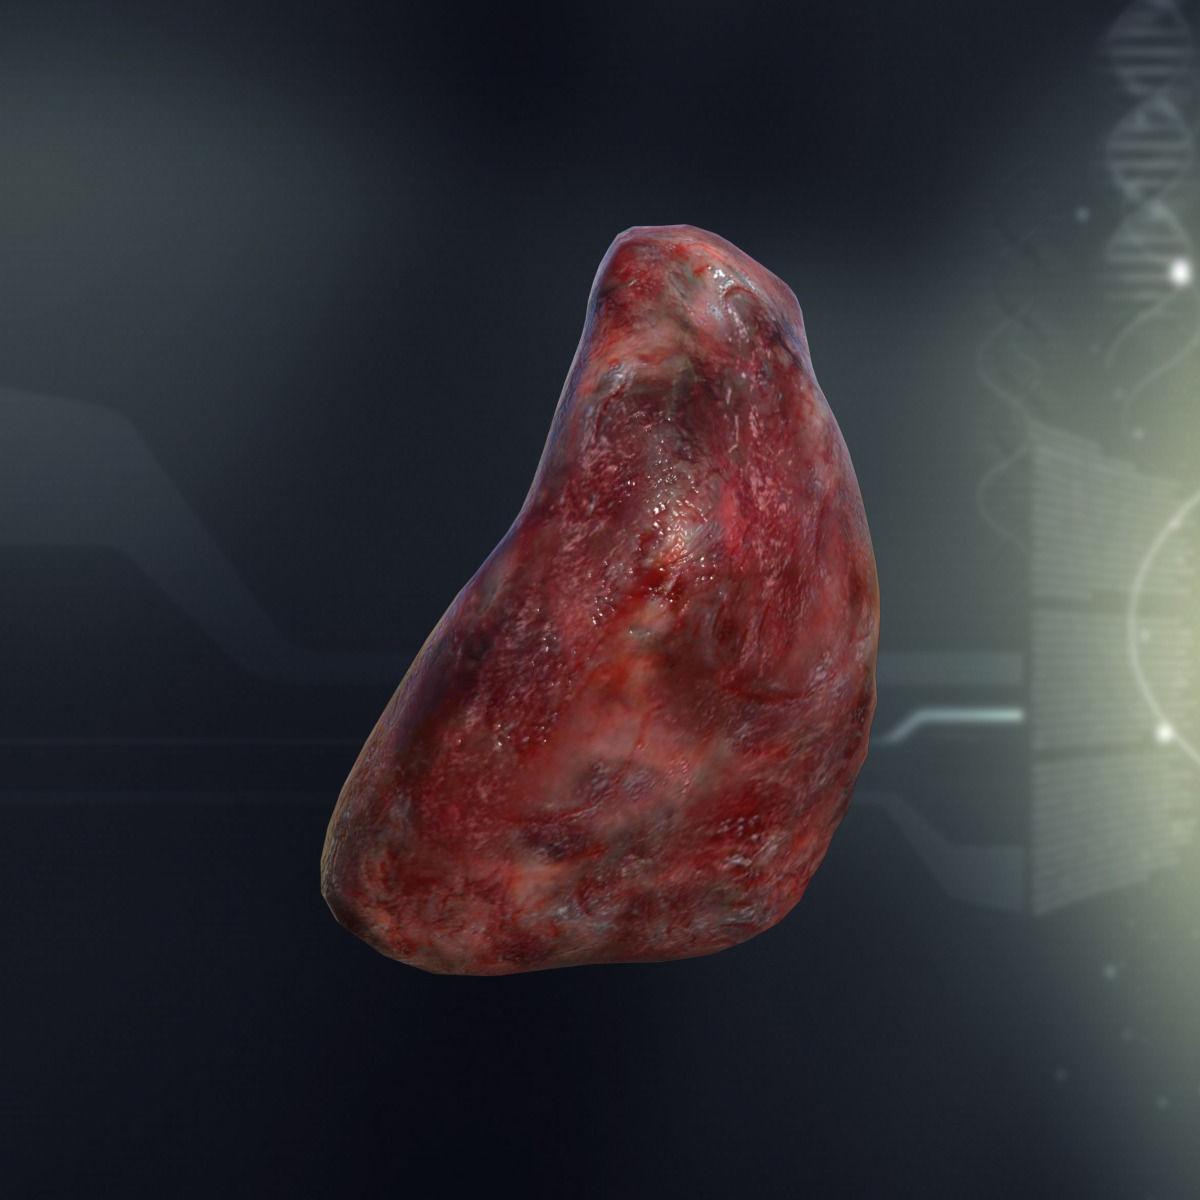 Human Spleen Anatomy 3d Model Game Ready X Obj 3ds Fbx C4d Lwo Lw Lws